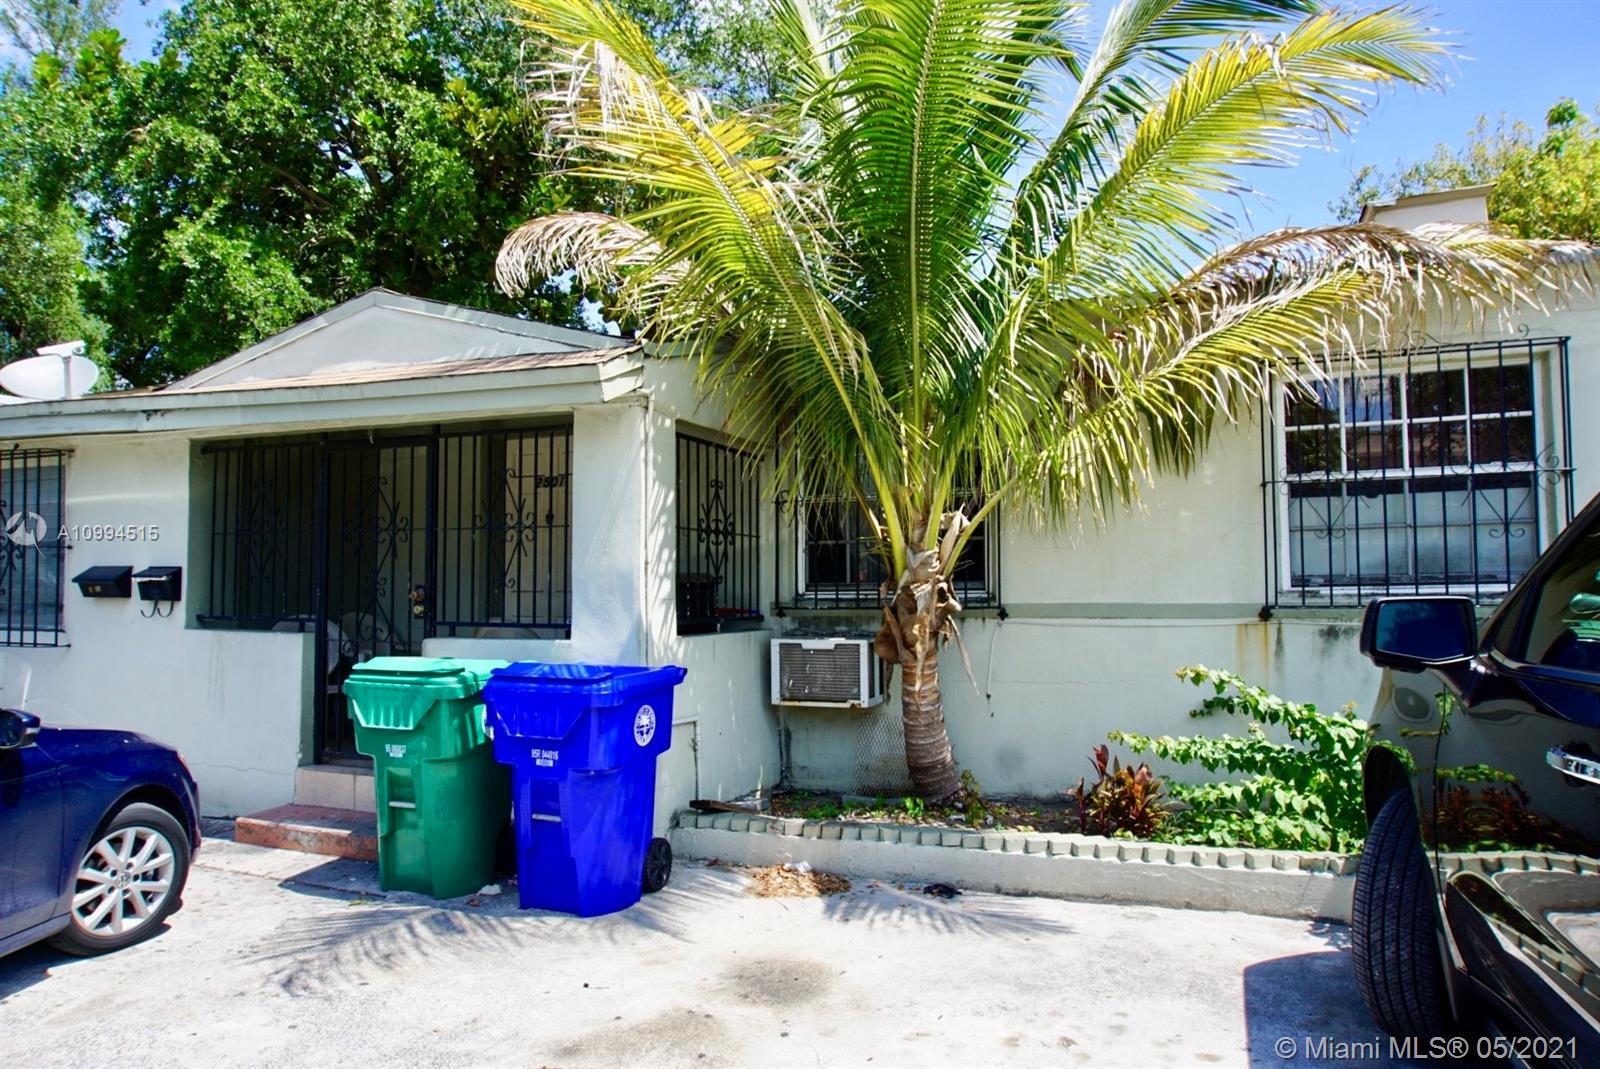 /  2051 sq. ft. $ 2021-03-30 0 Photo